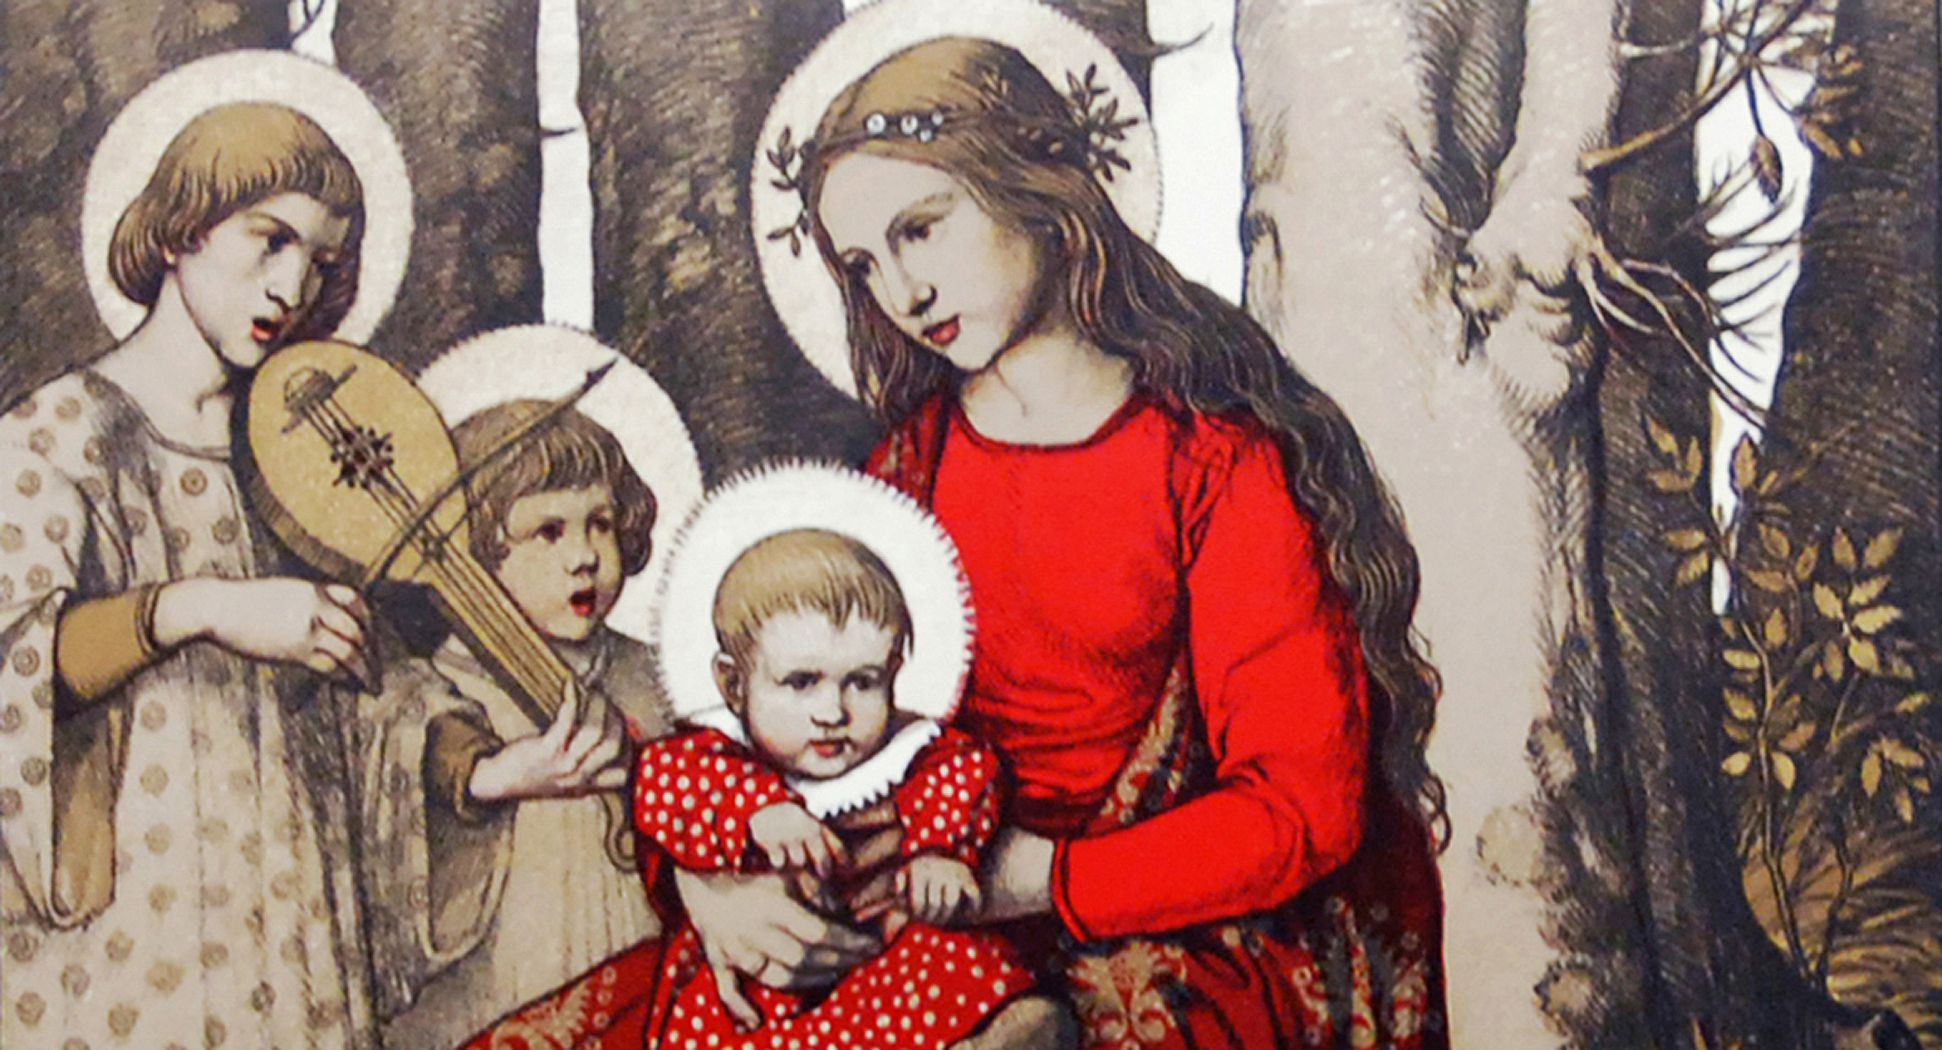 Maria im Walde obere Bildhälfte